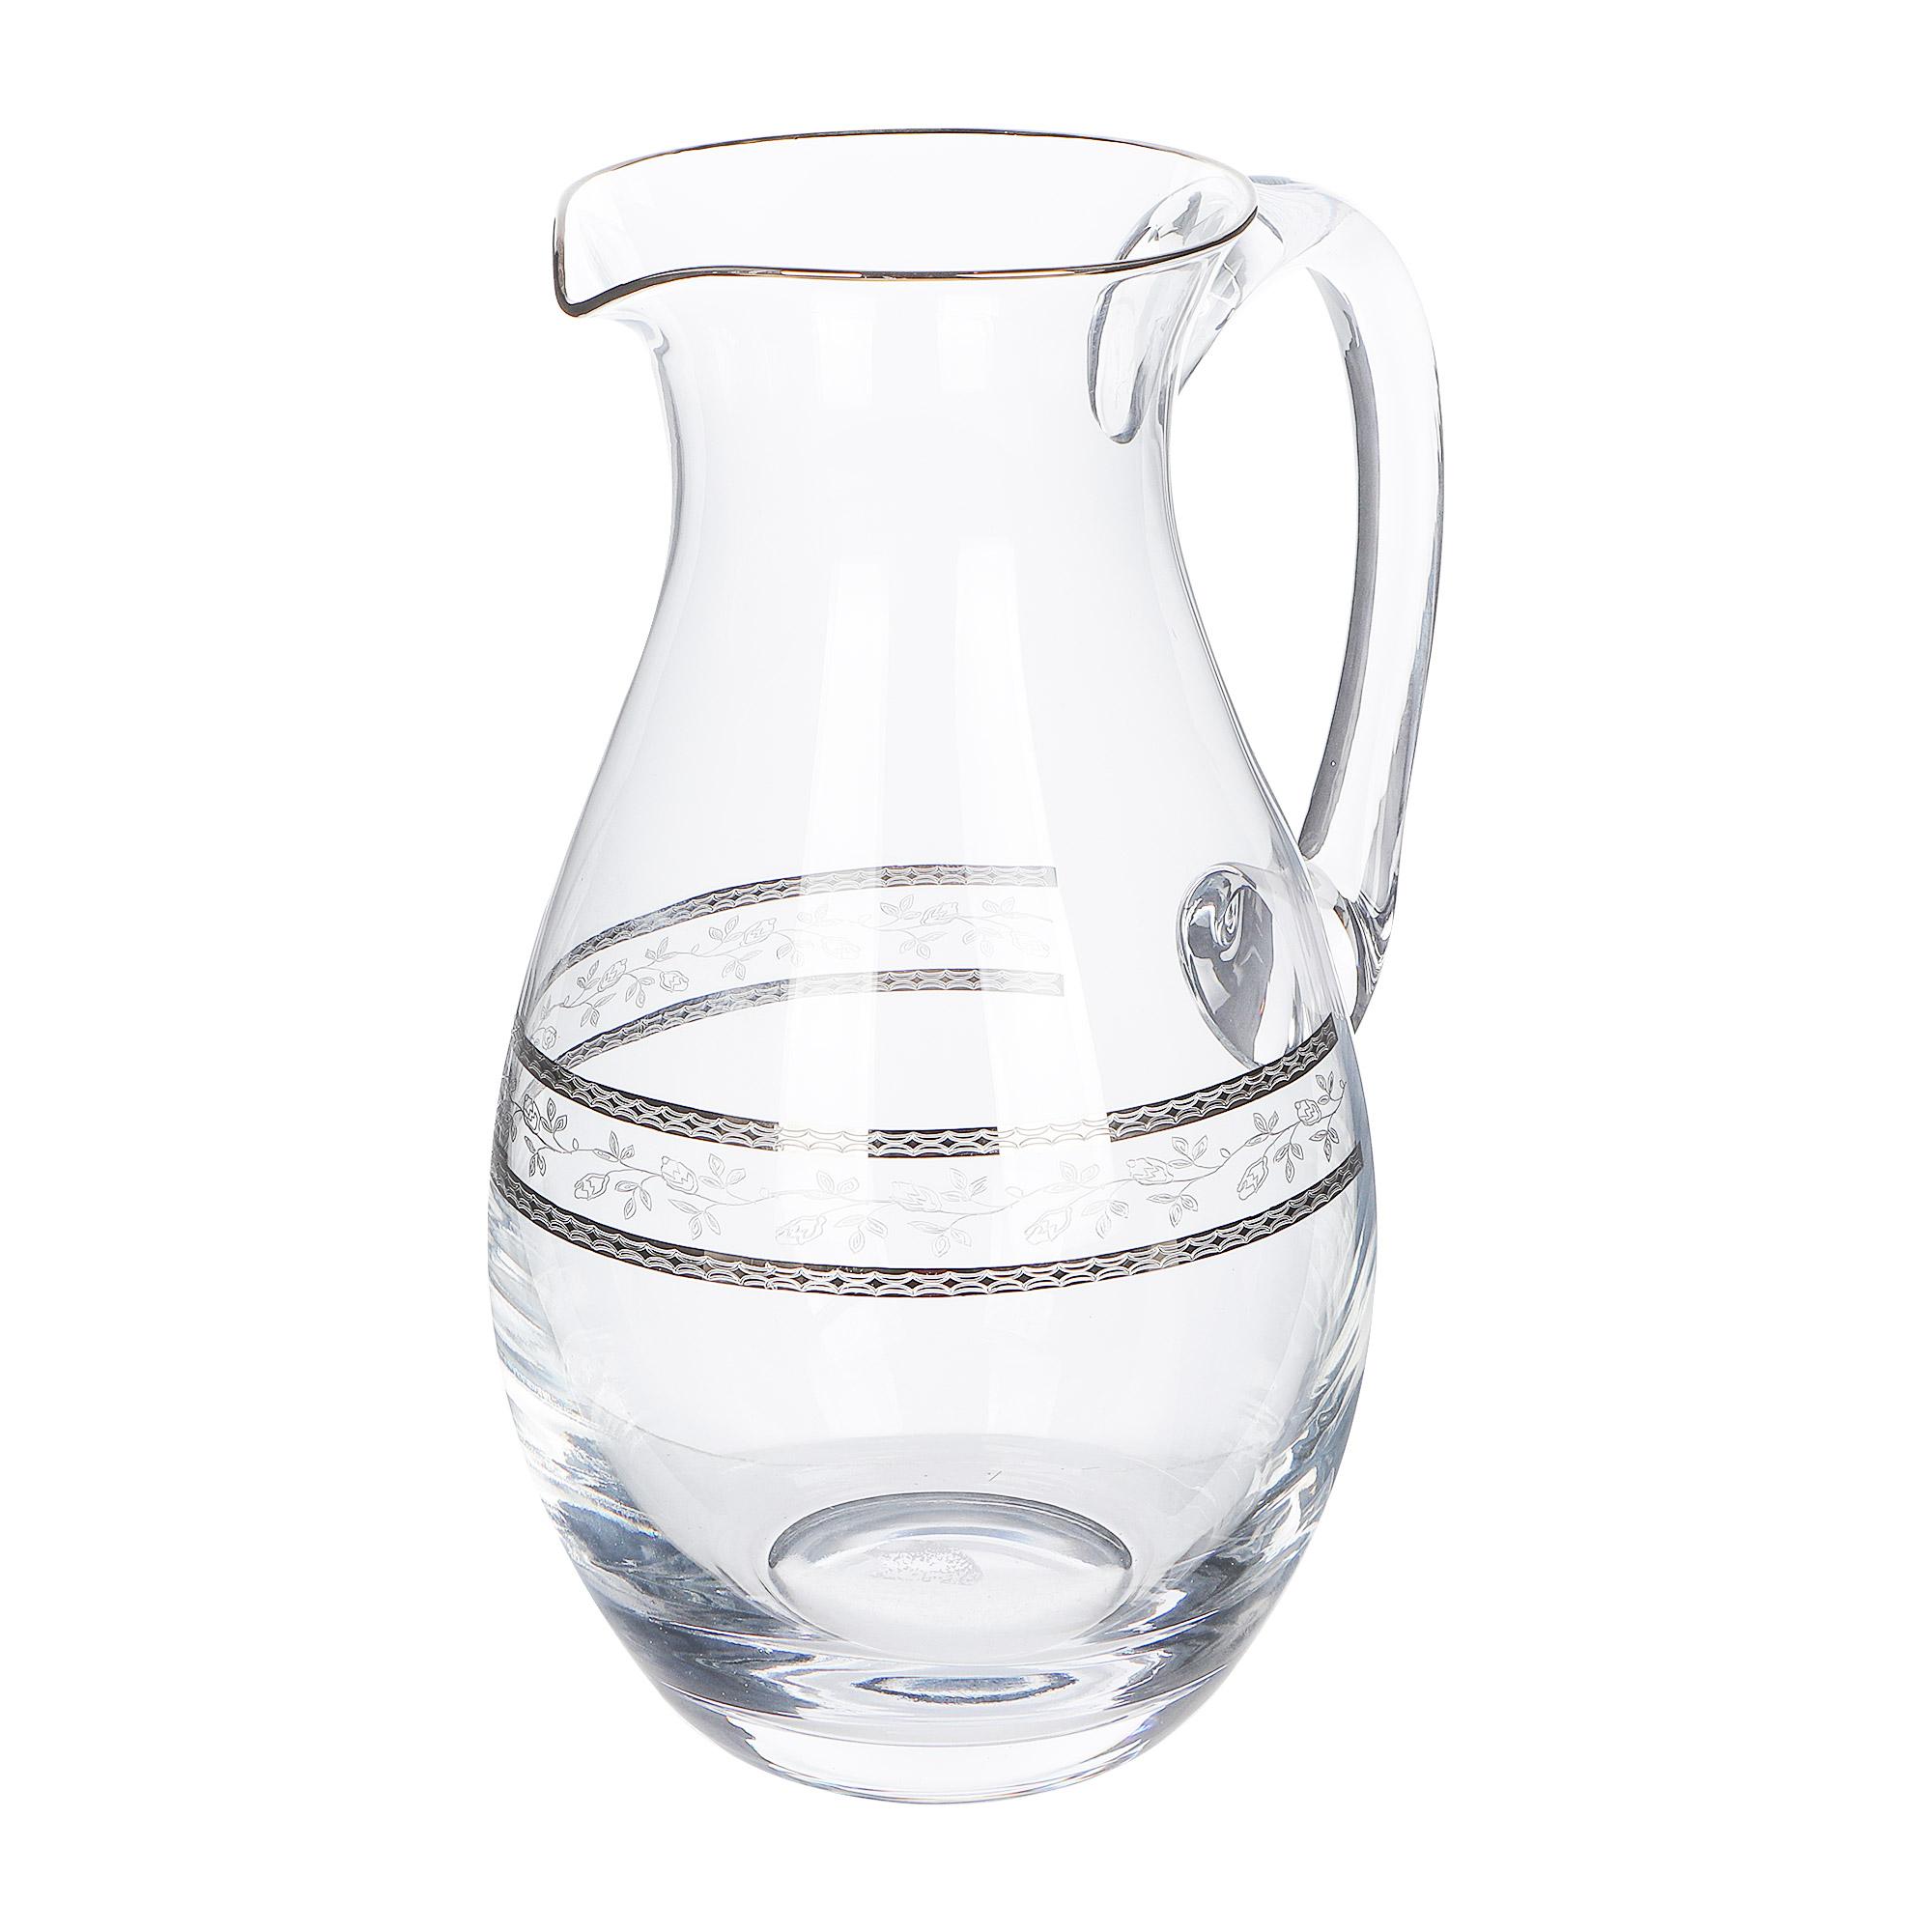 rona Кувшин Rona орнамент серебряный 1,9 л